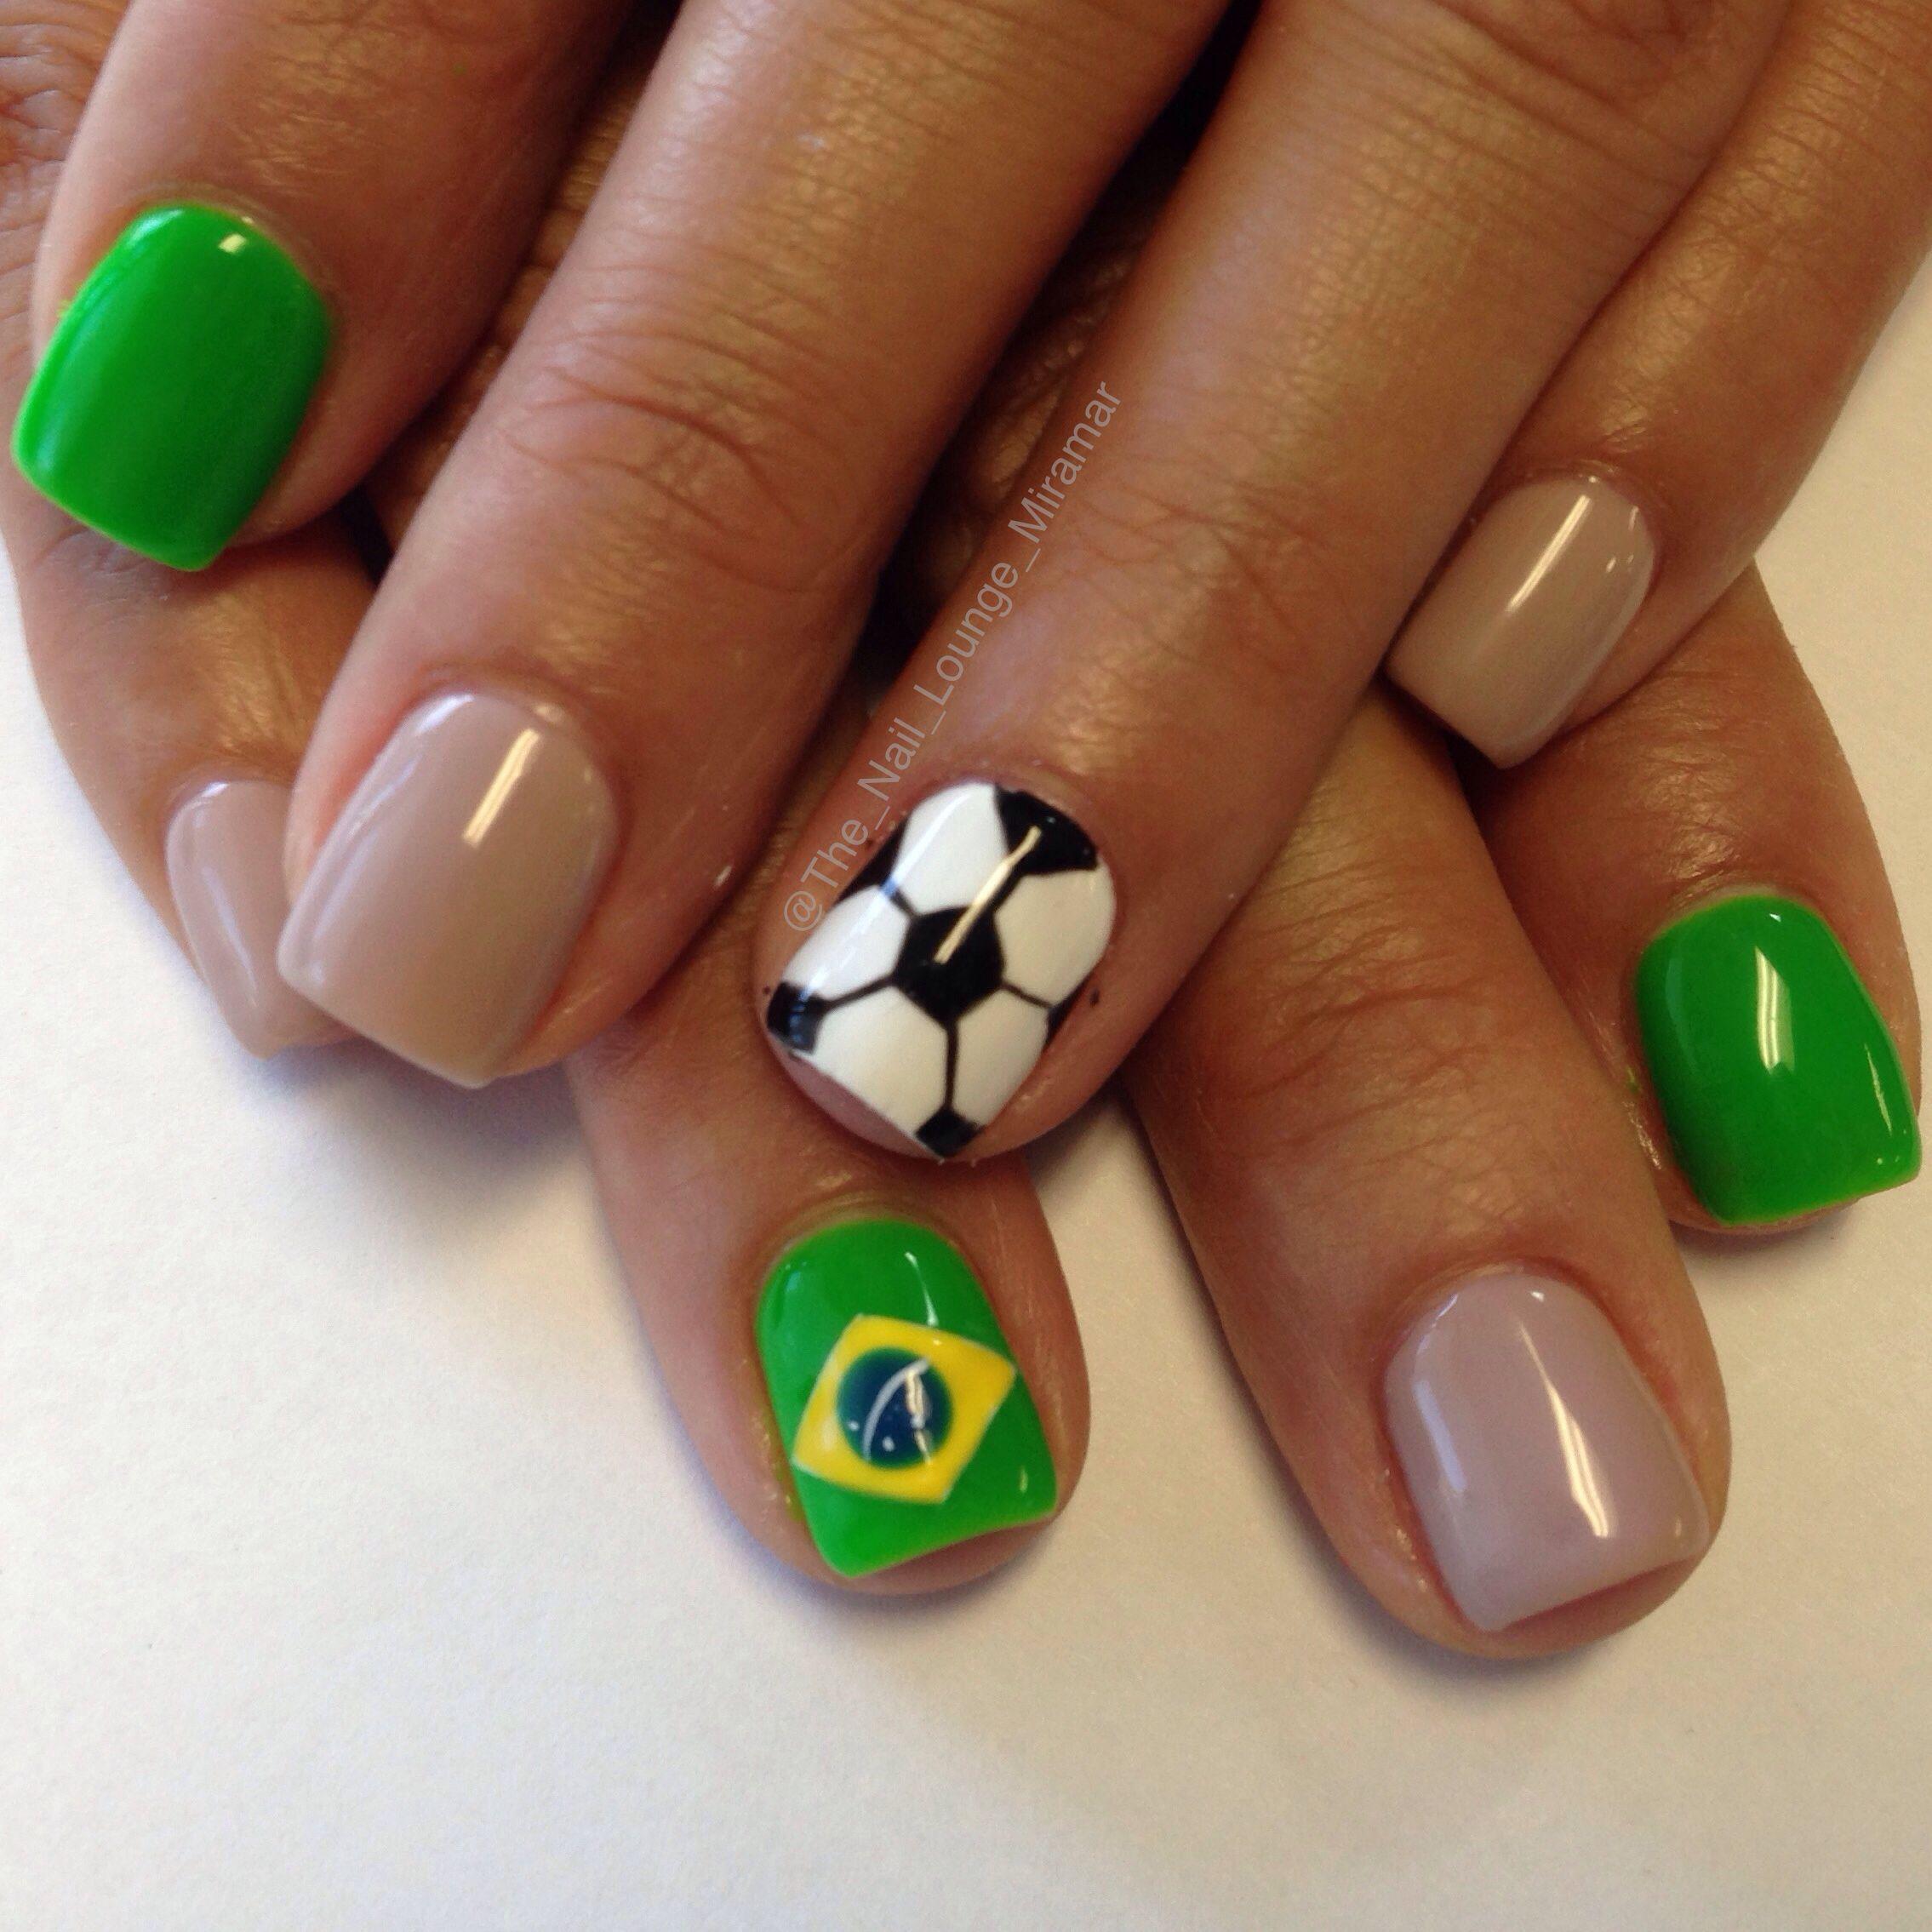 2014 World Cup brasil soccer nail art design